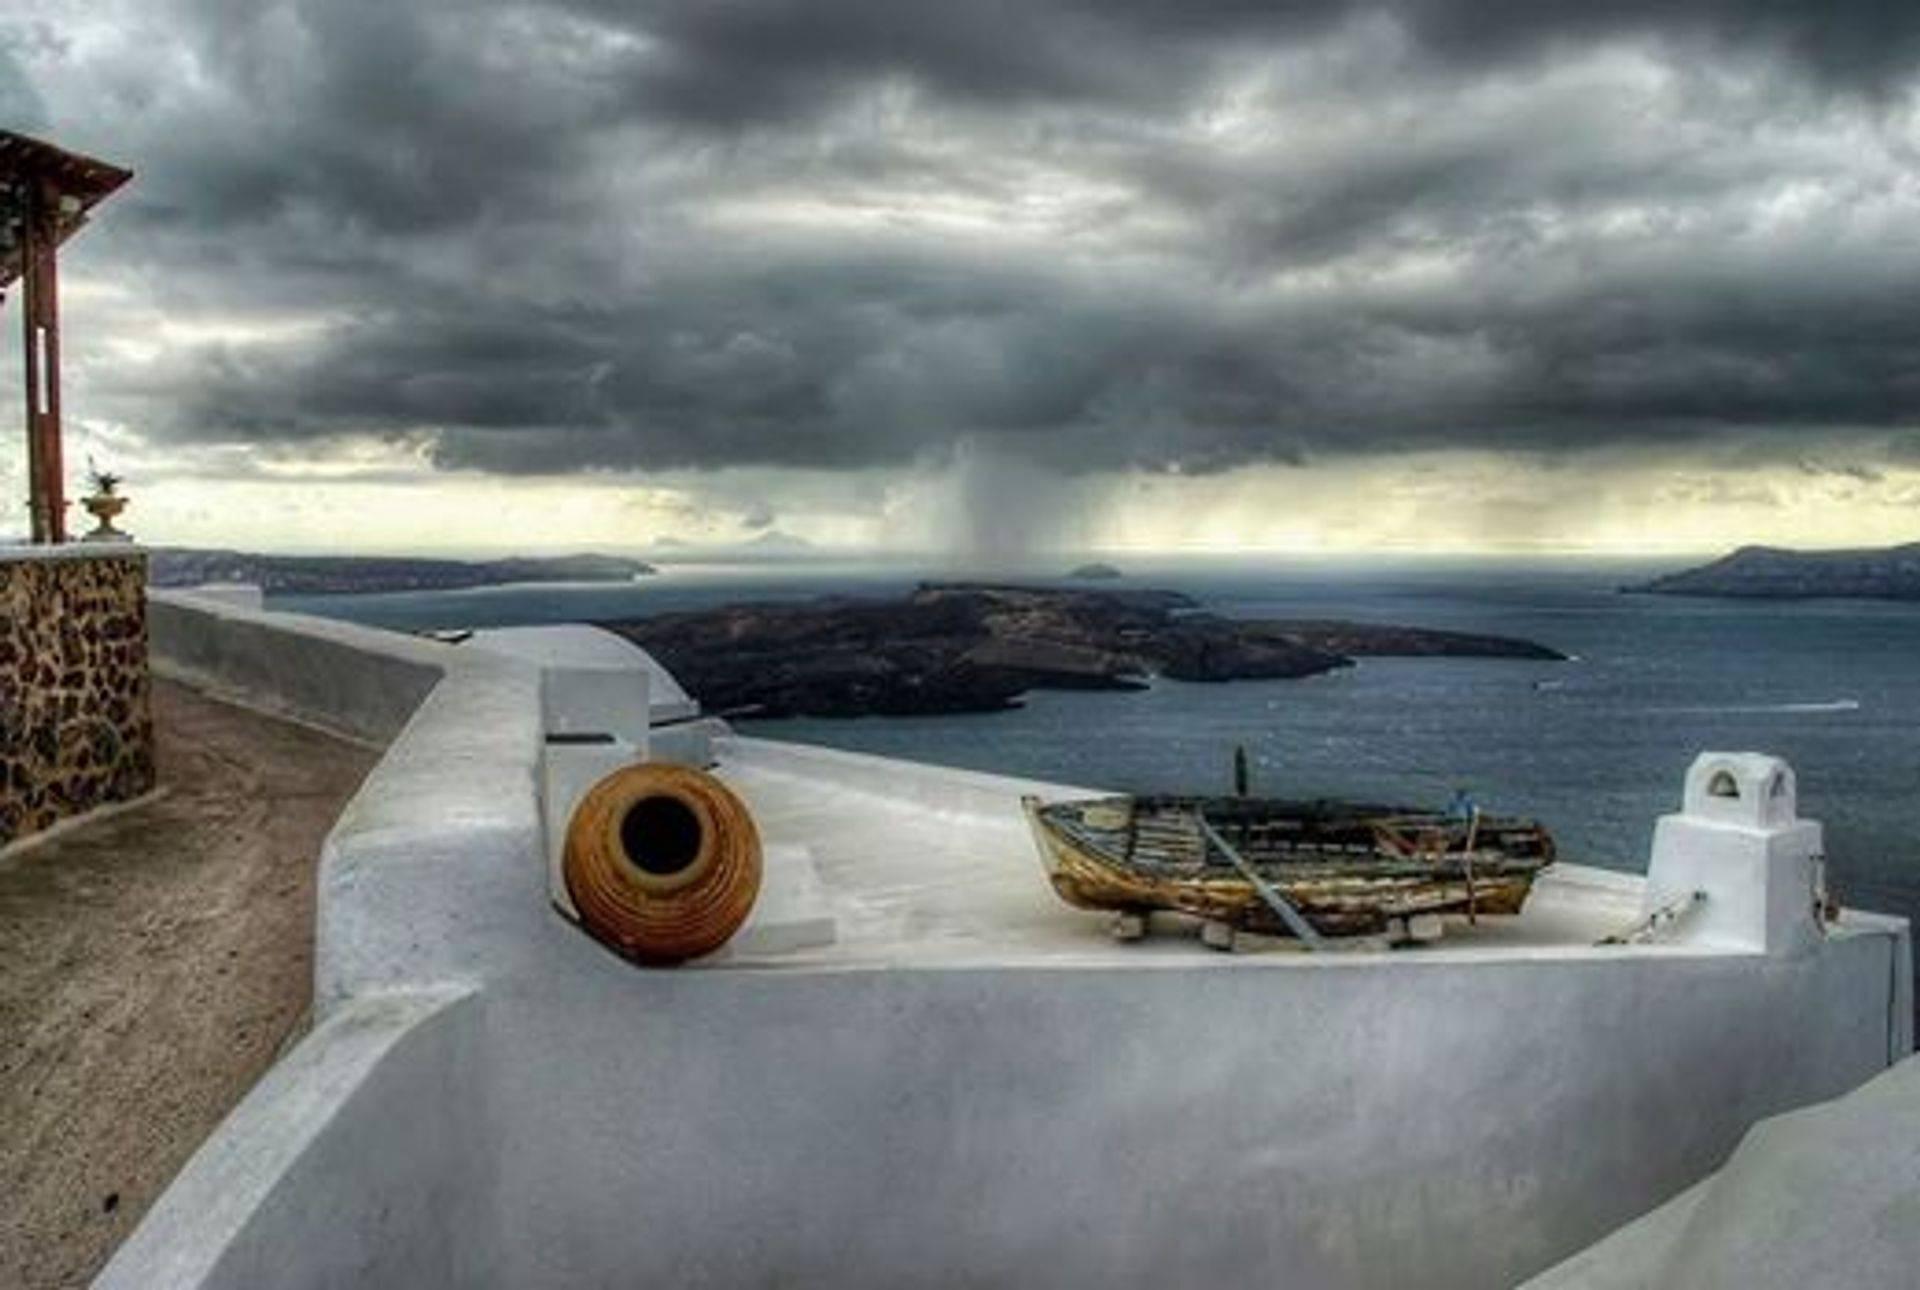 Winter Grey on the Greek islands, January 2015